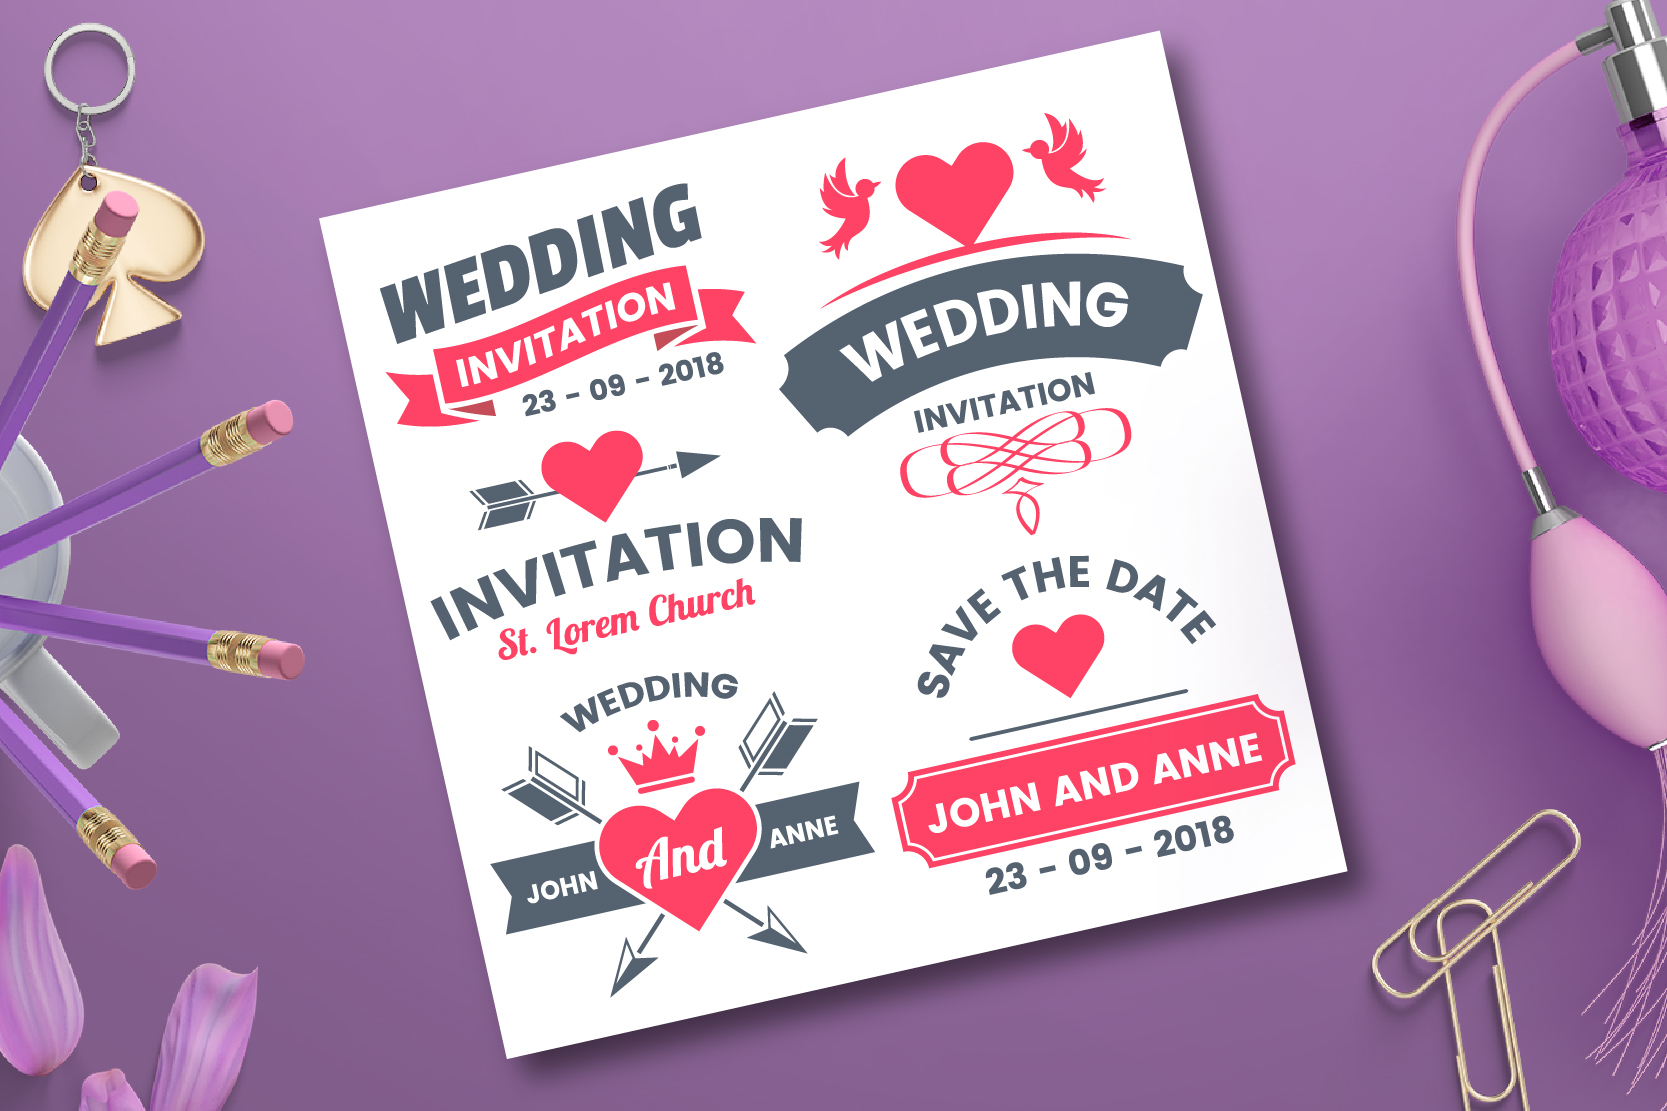 43 WEDDING VINTAGE BADGE & RIBBON example image 3